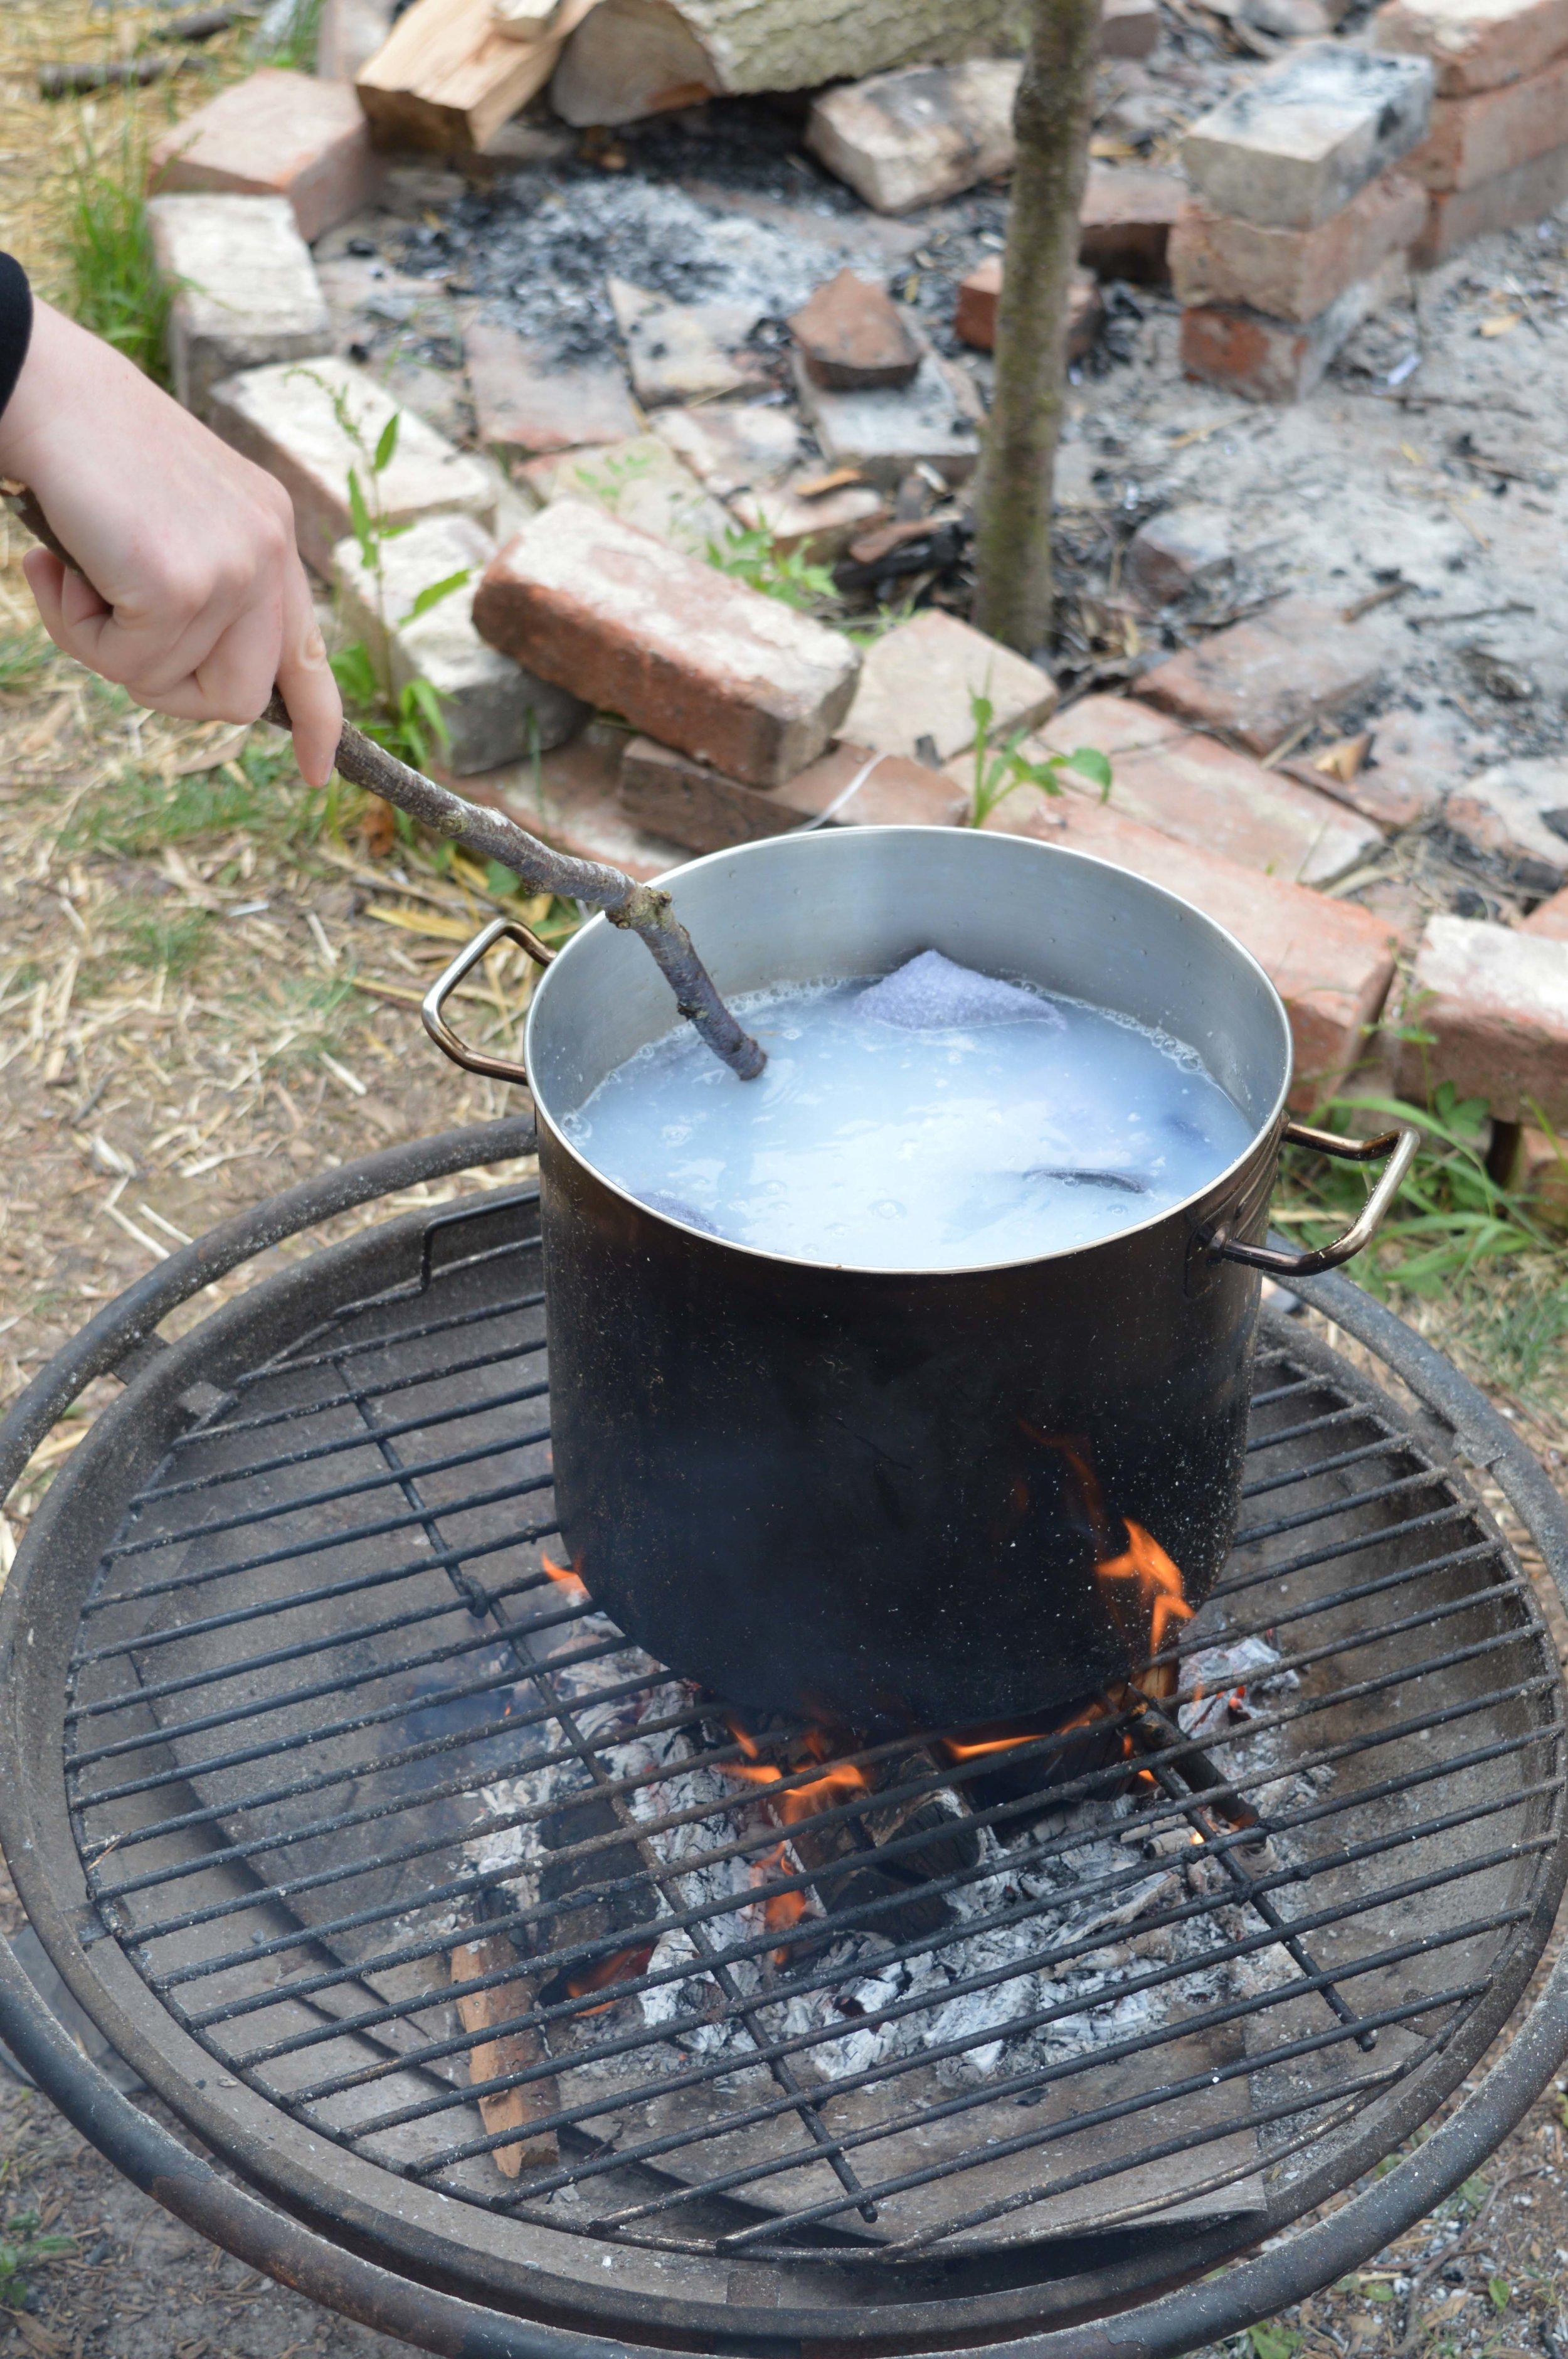 Washing in a bucket